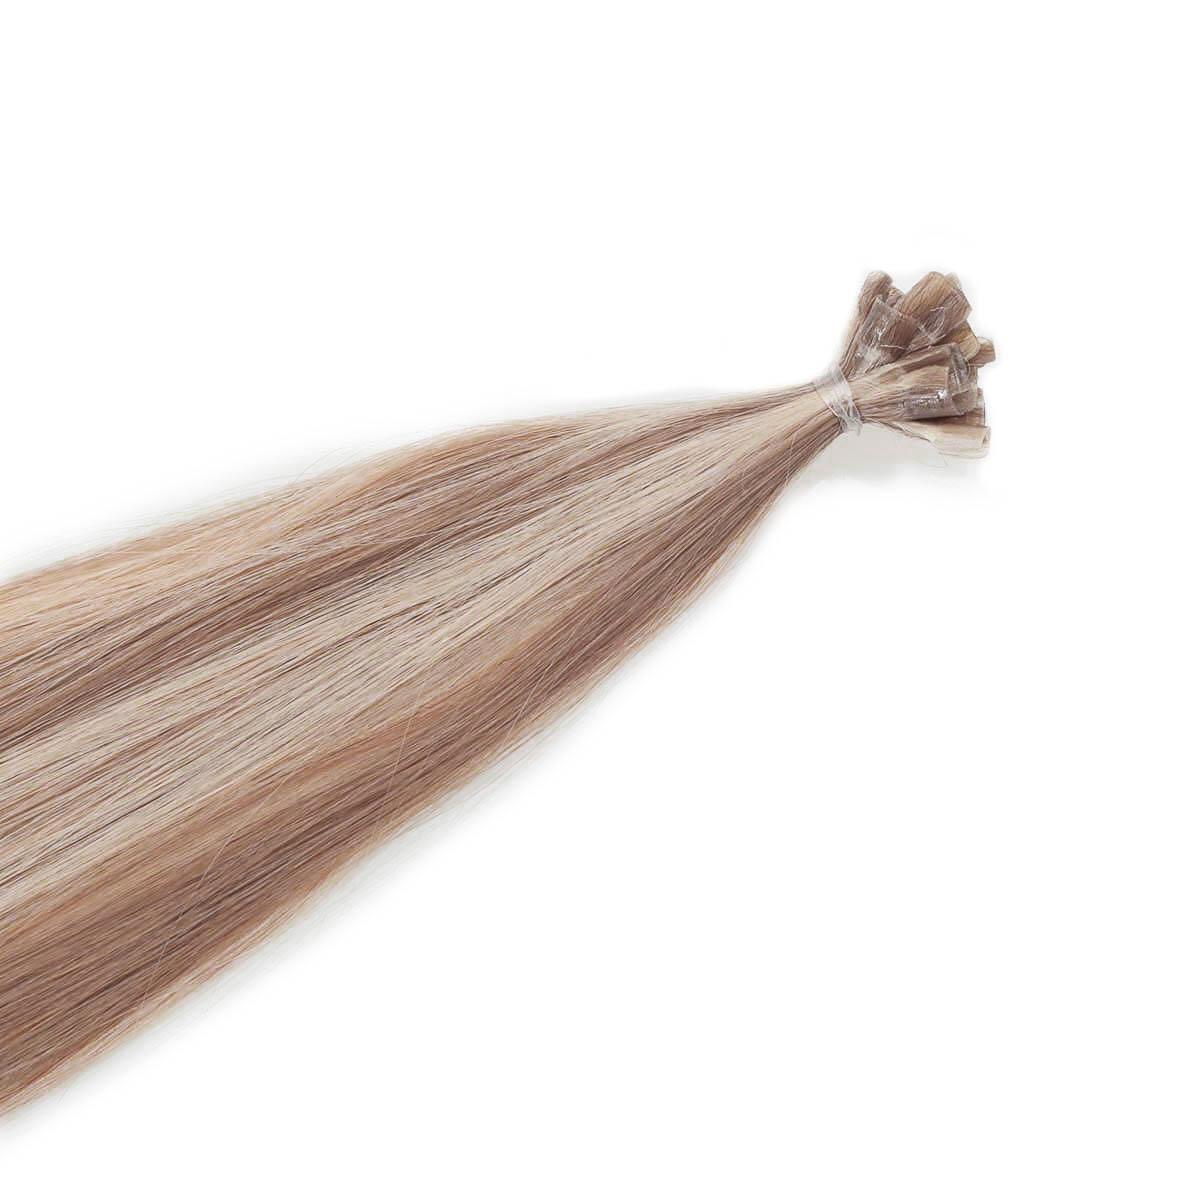 Nail Hair M7.3/10.8 Cendre Ash Blonde Mix 40 cm